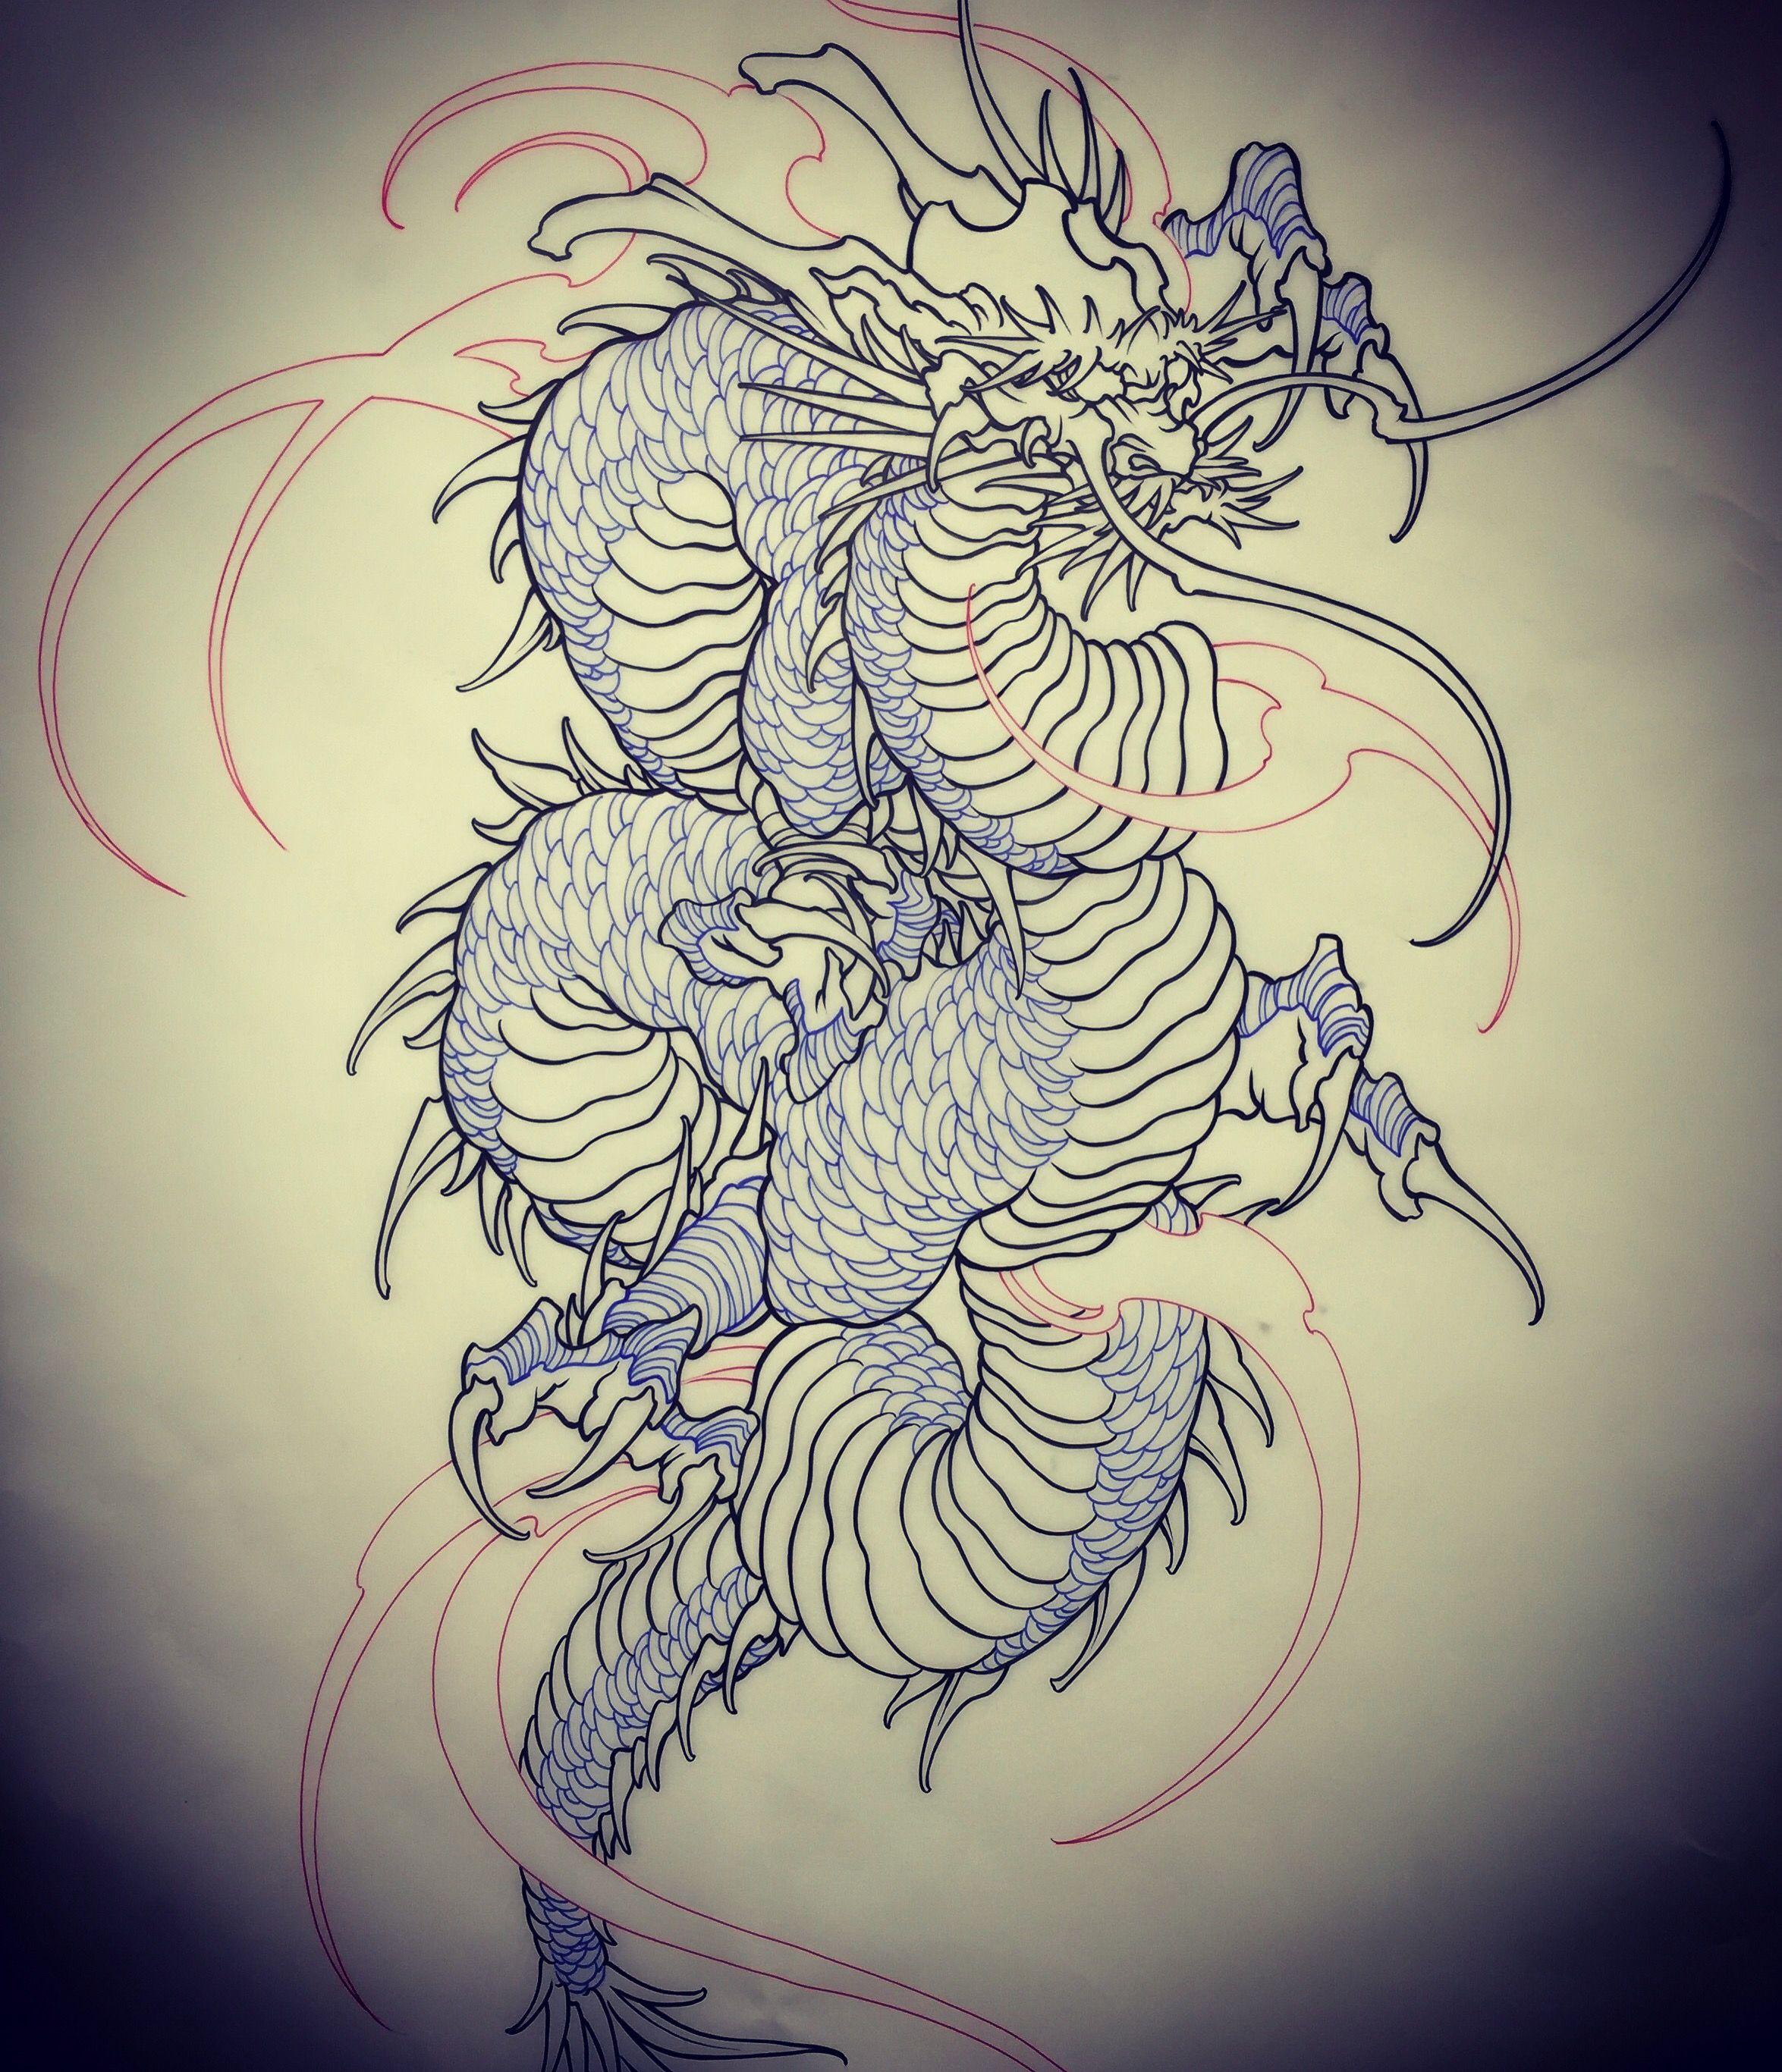 Amsterdam Tattoo 1825 Kimihito Dragon Japanese Style Tattoo Design Netherlands Japanese Ta Dragon Tattoo Colour Japanese Dragon Tattoos Japanese Tattoo Artist